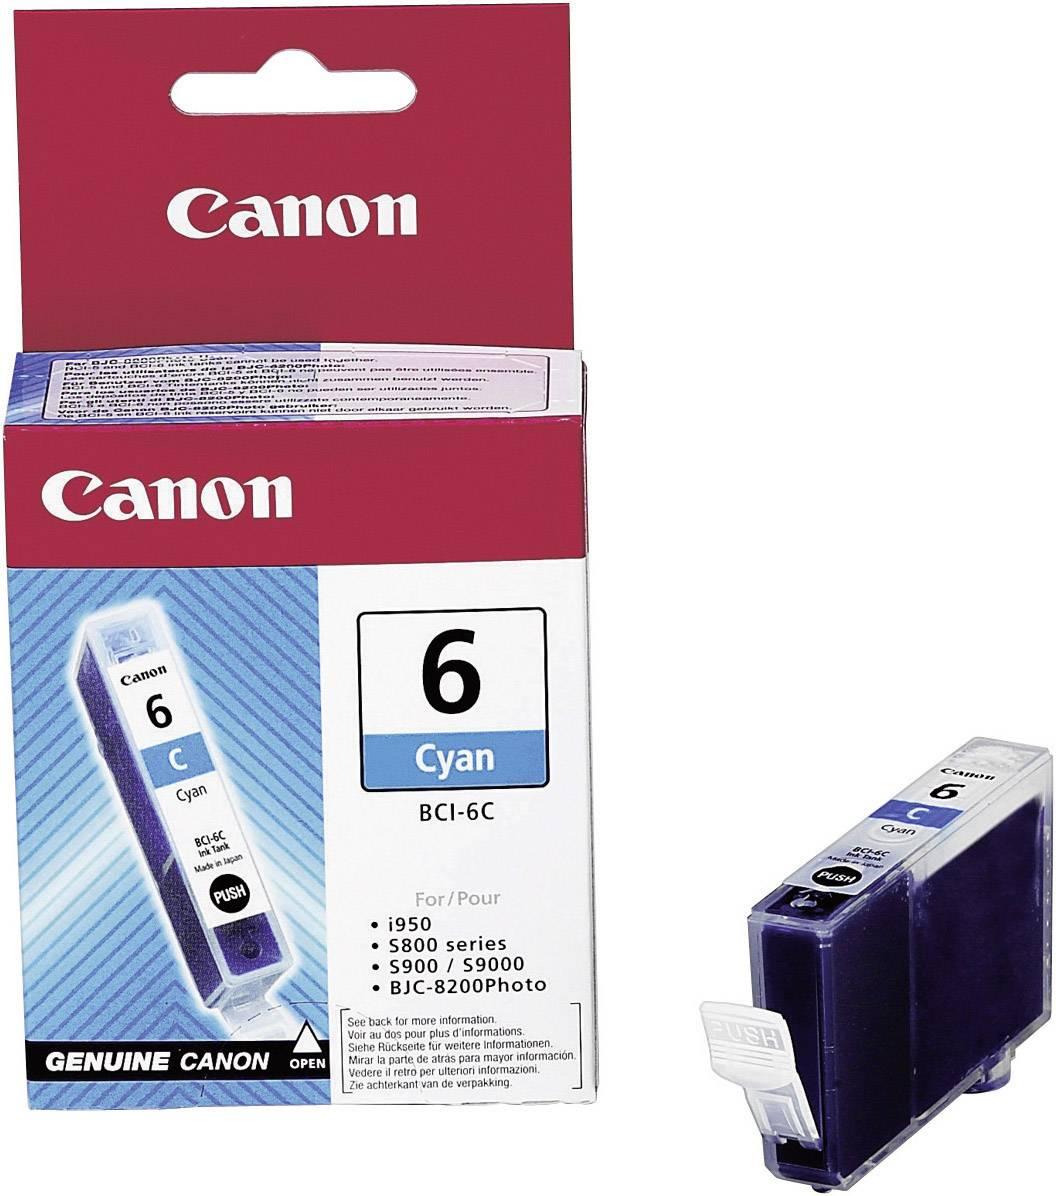 Náplň do tlačiarne Canon BCI-6C 4706A002, zelenomodrá